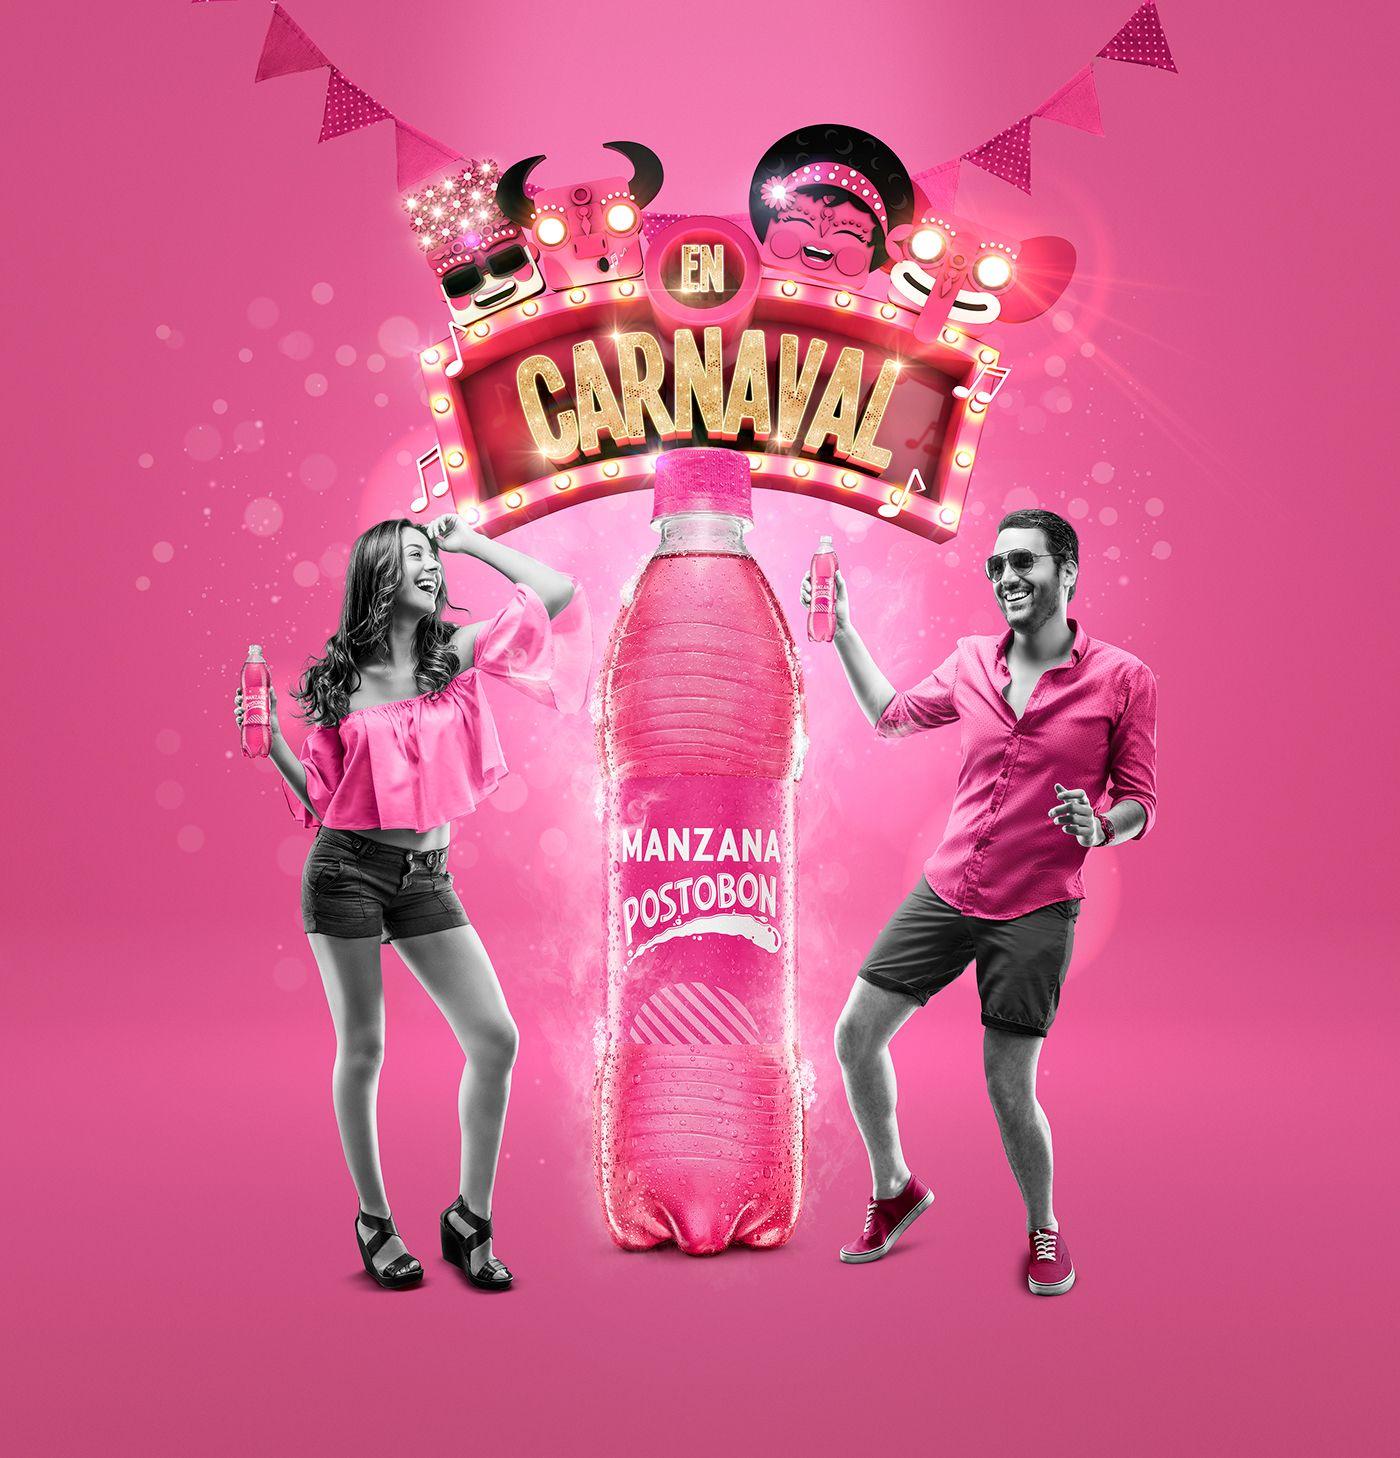 Carnaval de Barranquilla / Manzana Postobon on Behance